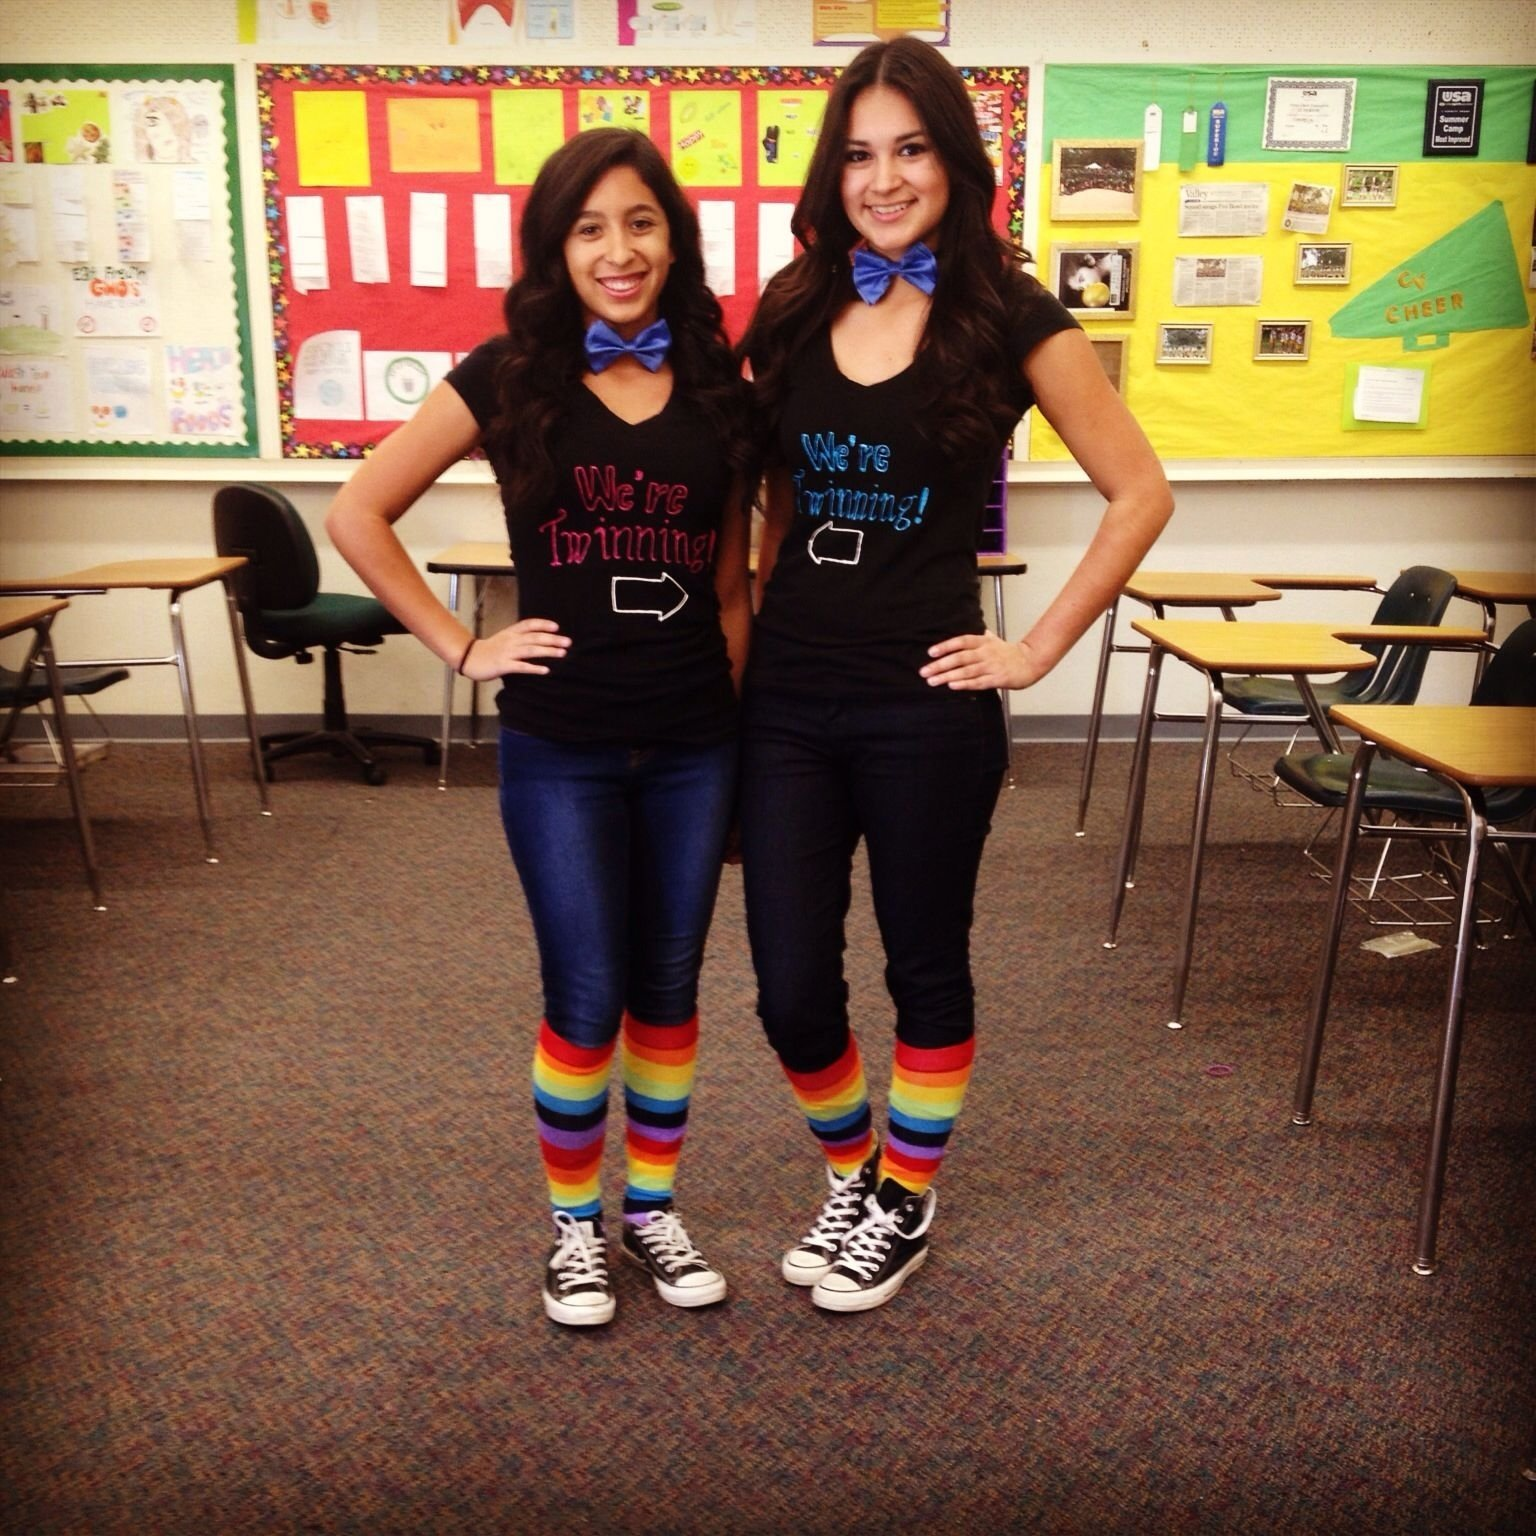 10 Wonderful Twin Day Ideas For Girls twin day spirit week at school my lifee29da4 pinterest twins 2021